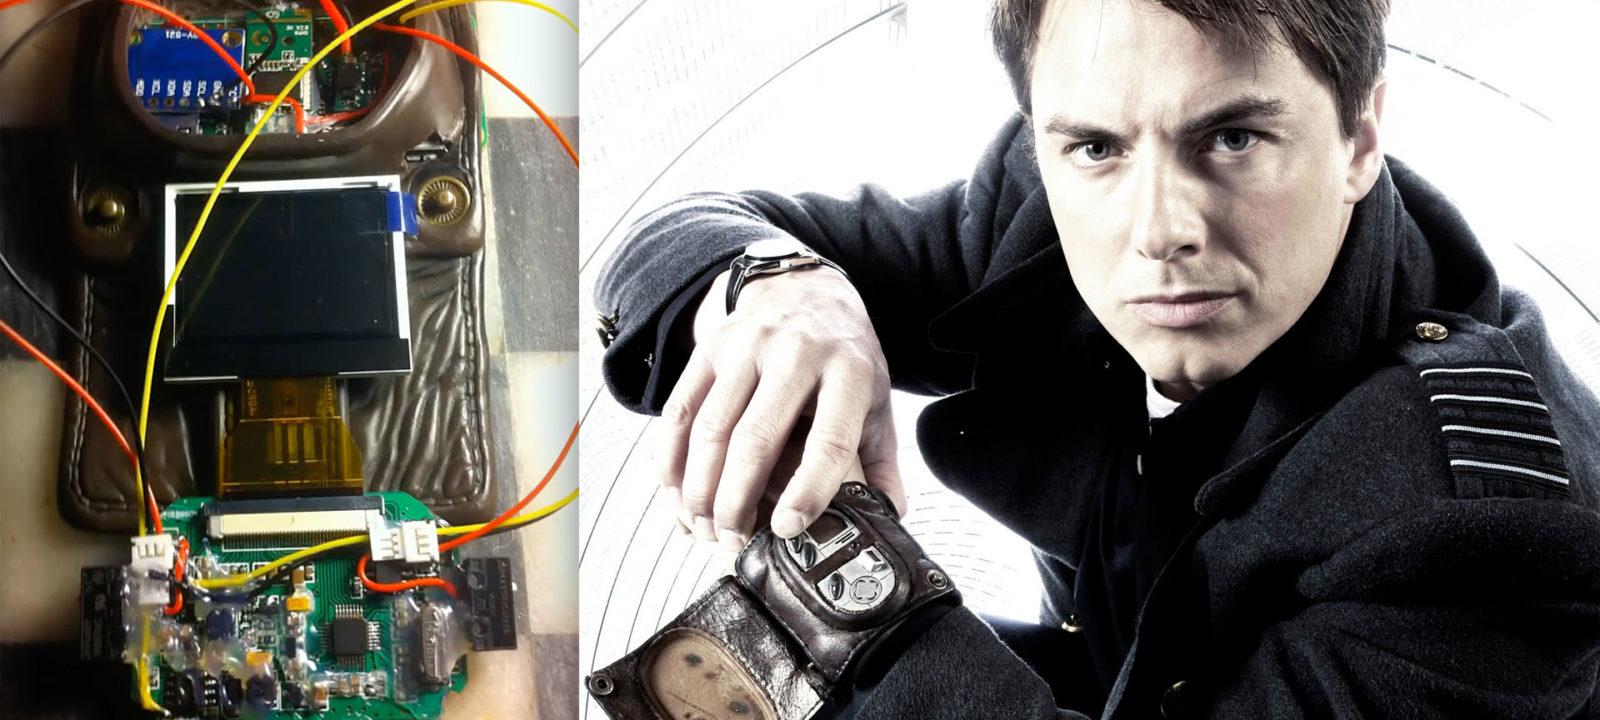 The Vortex Manipulator (Photos: YouTube/BBC)